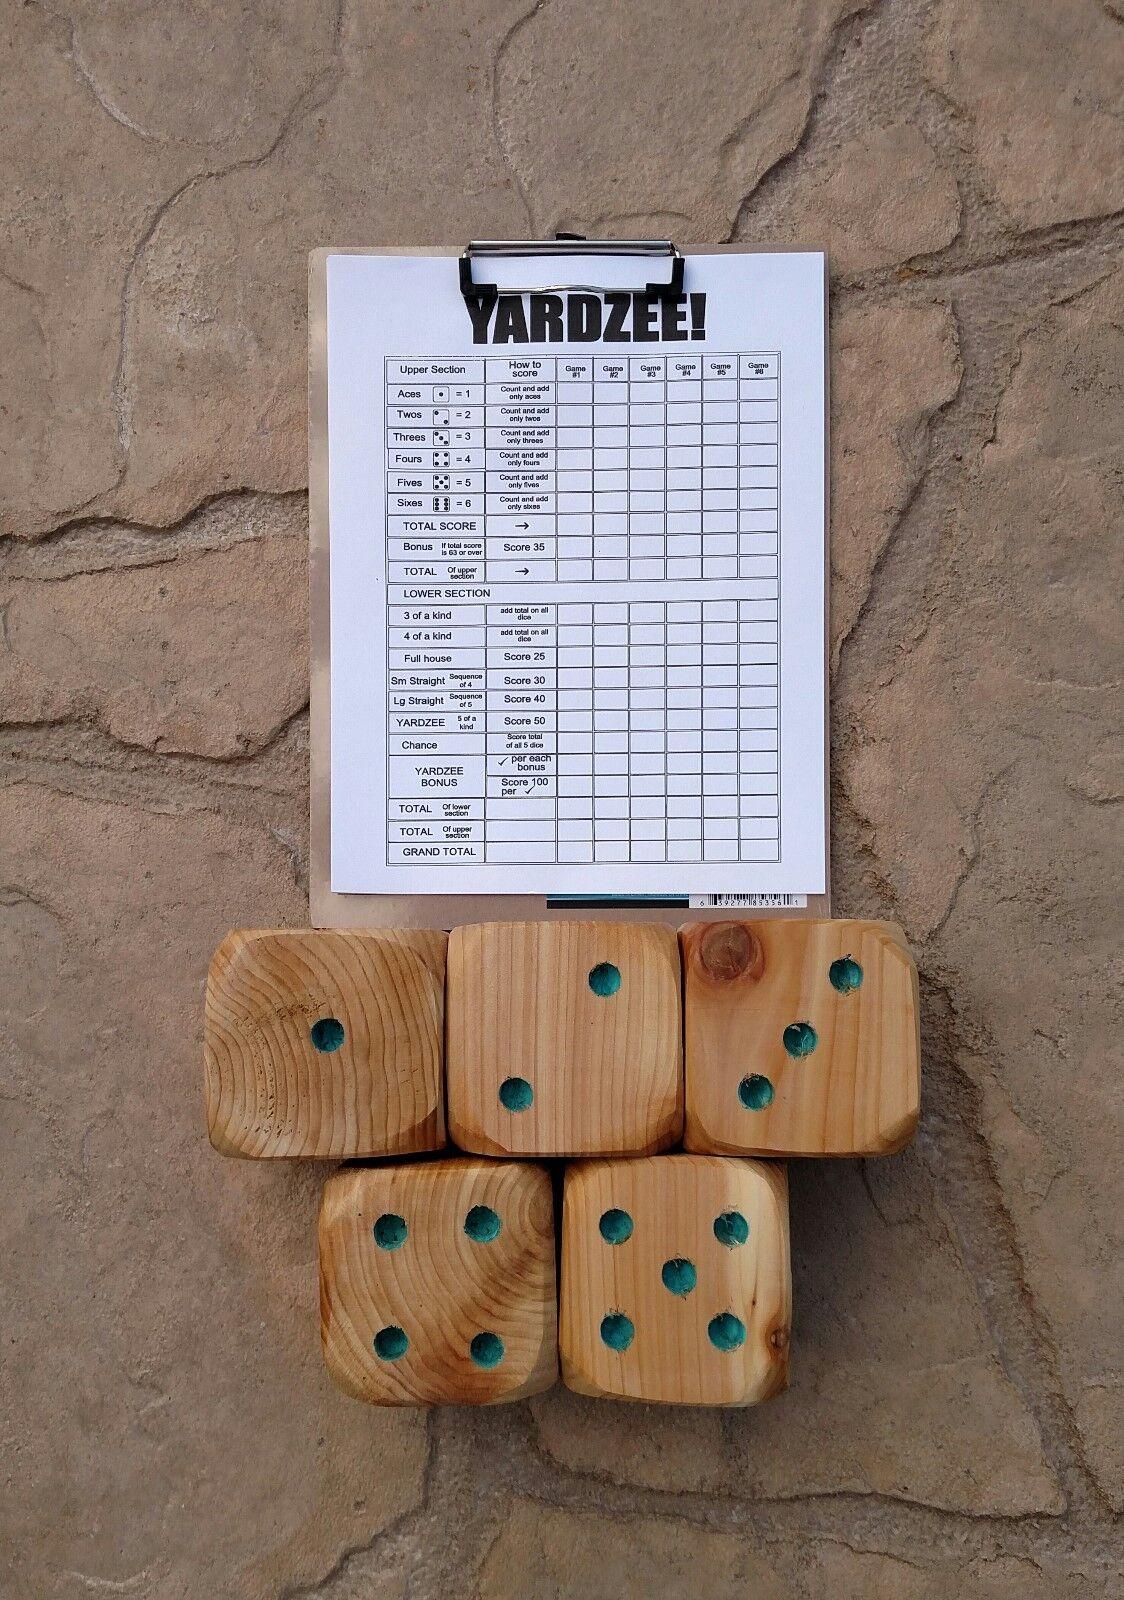 Handmade Turquoise Yardzee Outdoor Game 5 Dice Clipboard Score Sheets Family Fun